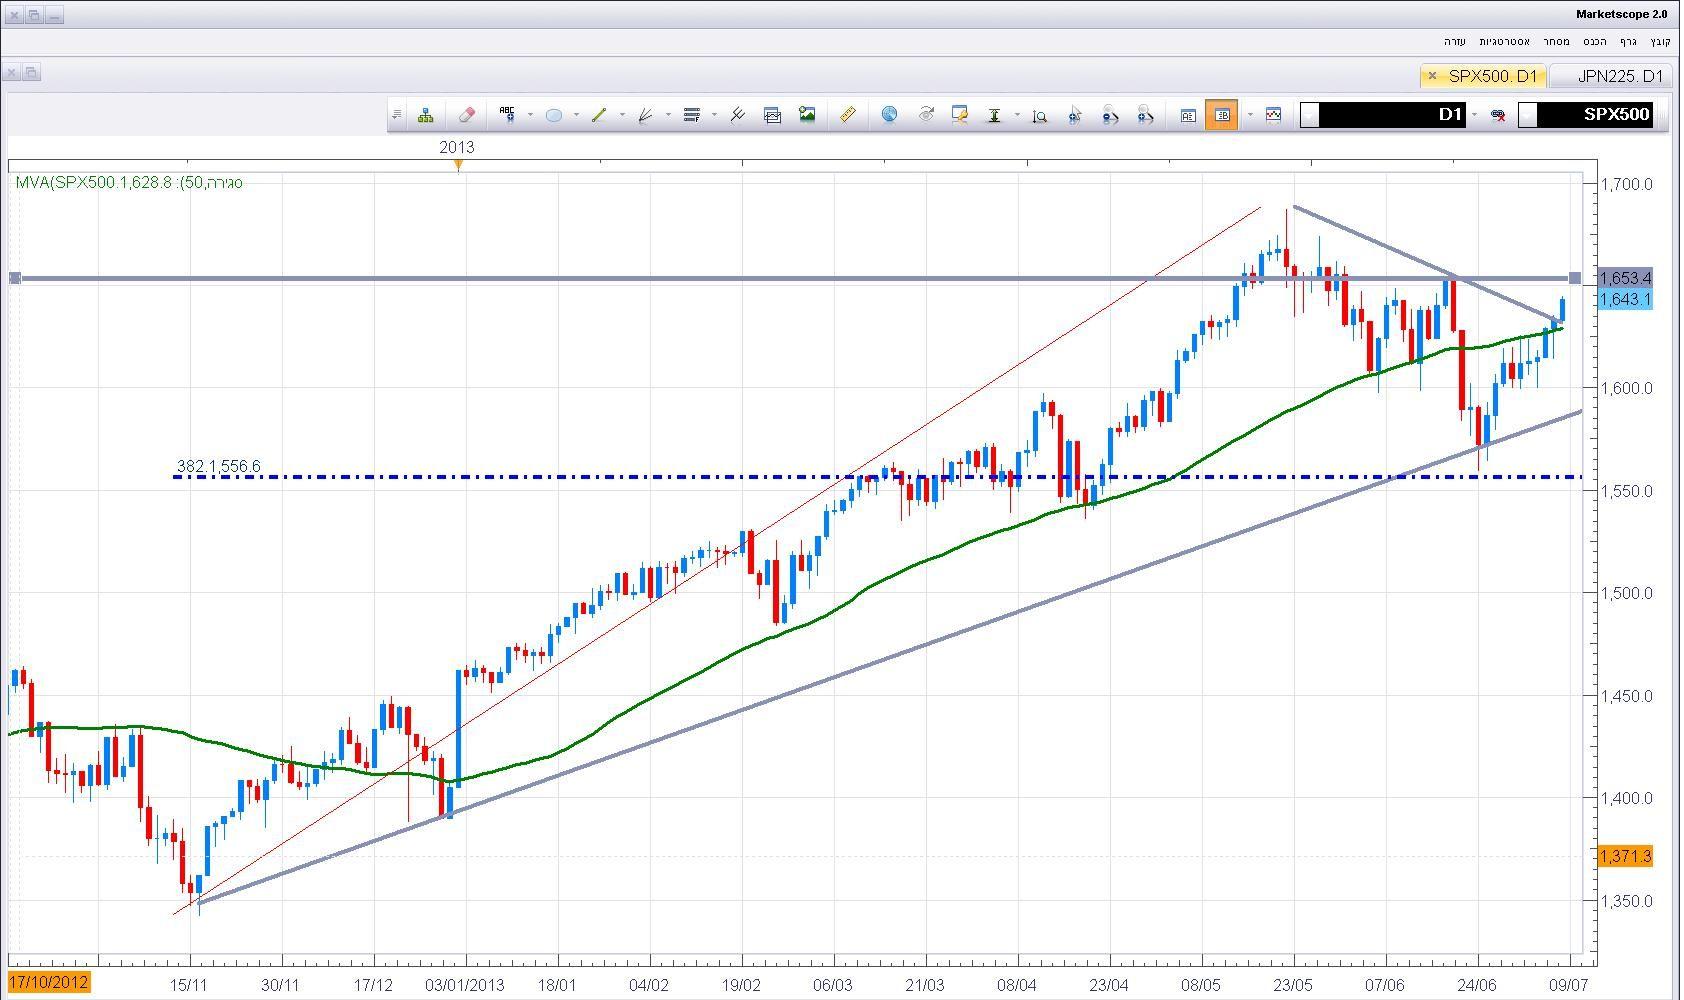 מדד ה-S&P500